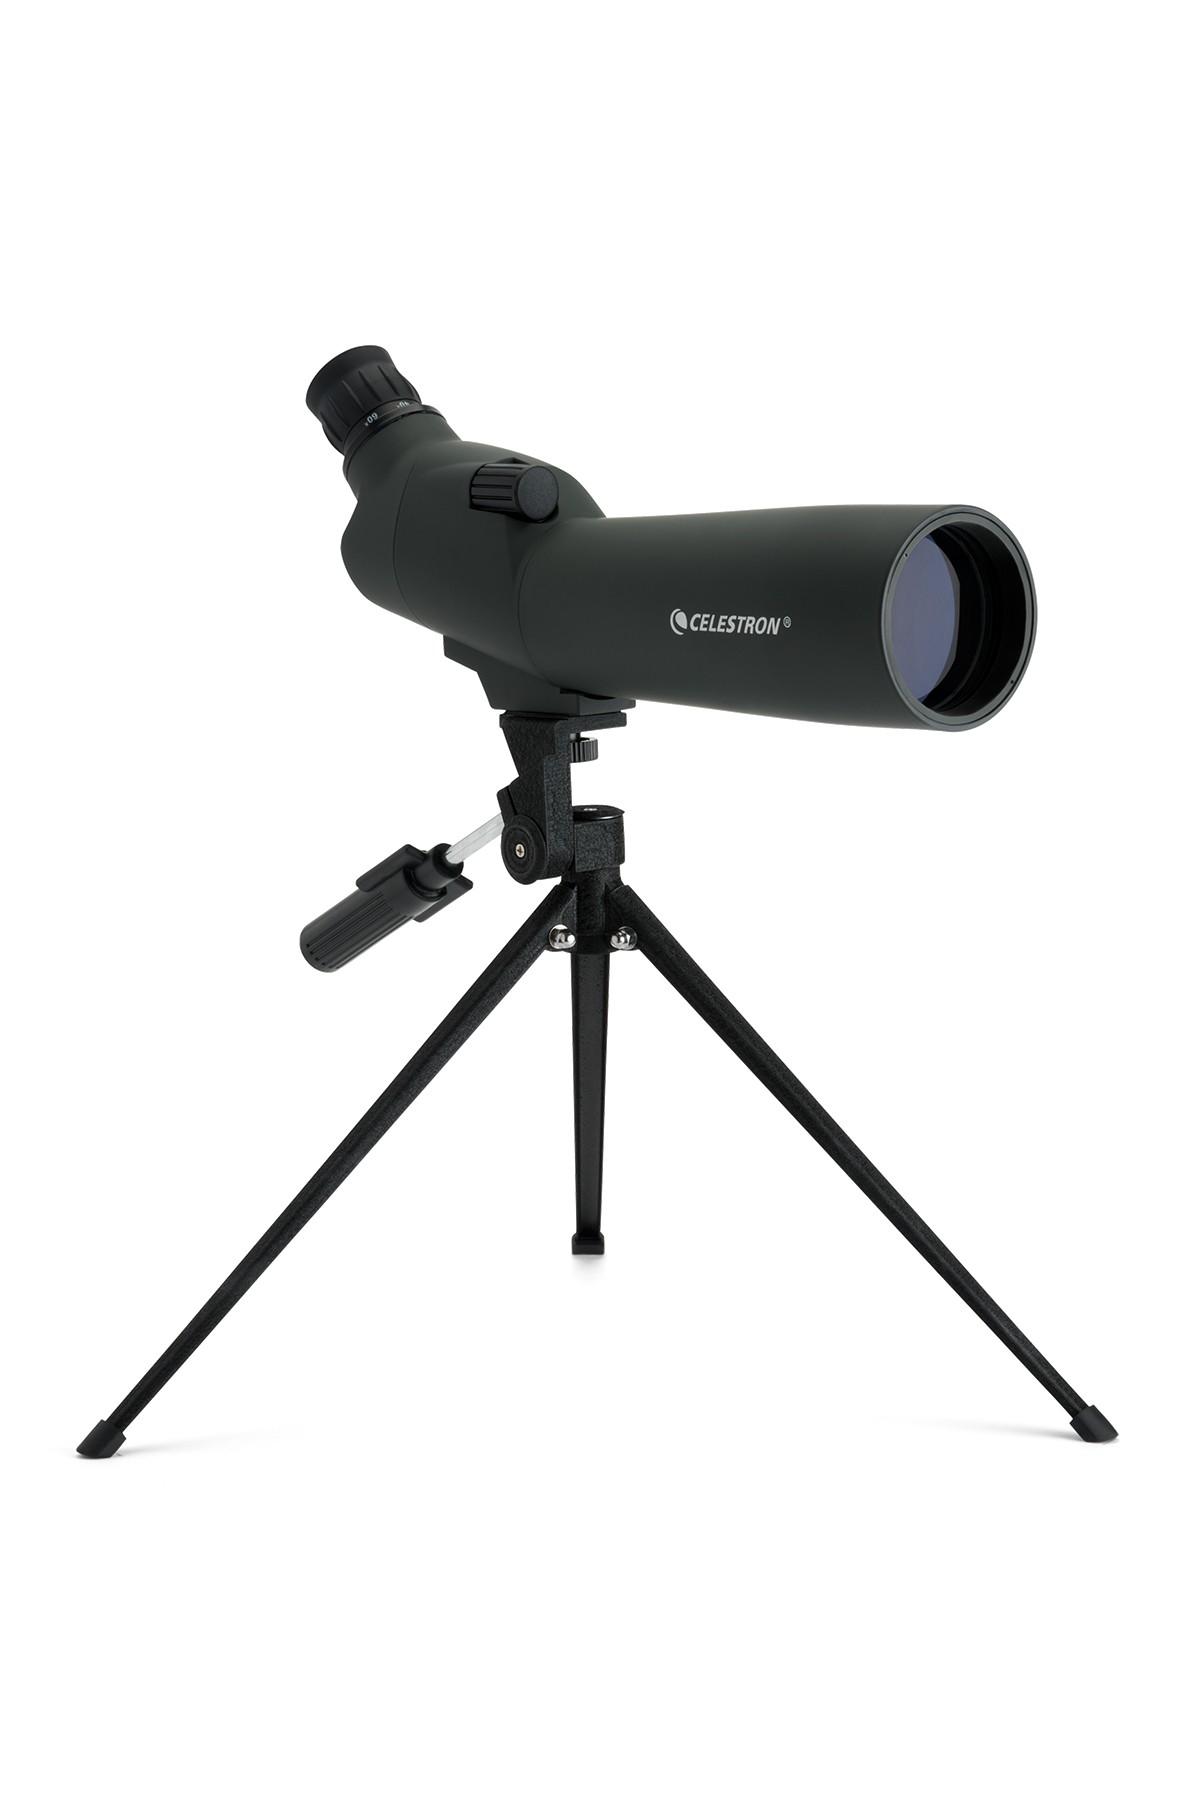 20-60x 60mm 45° Zoom Refraktor Spektiv